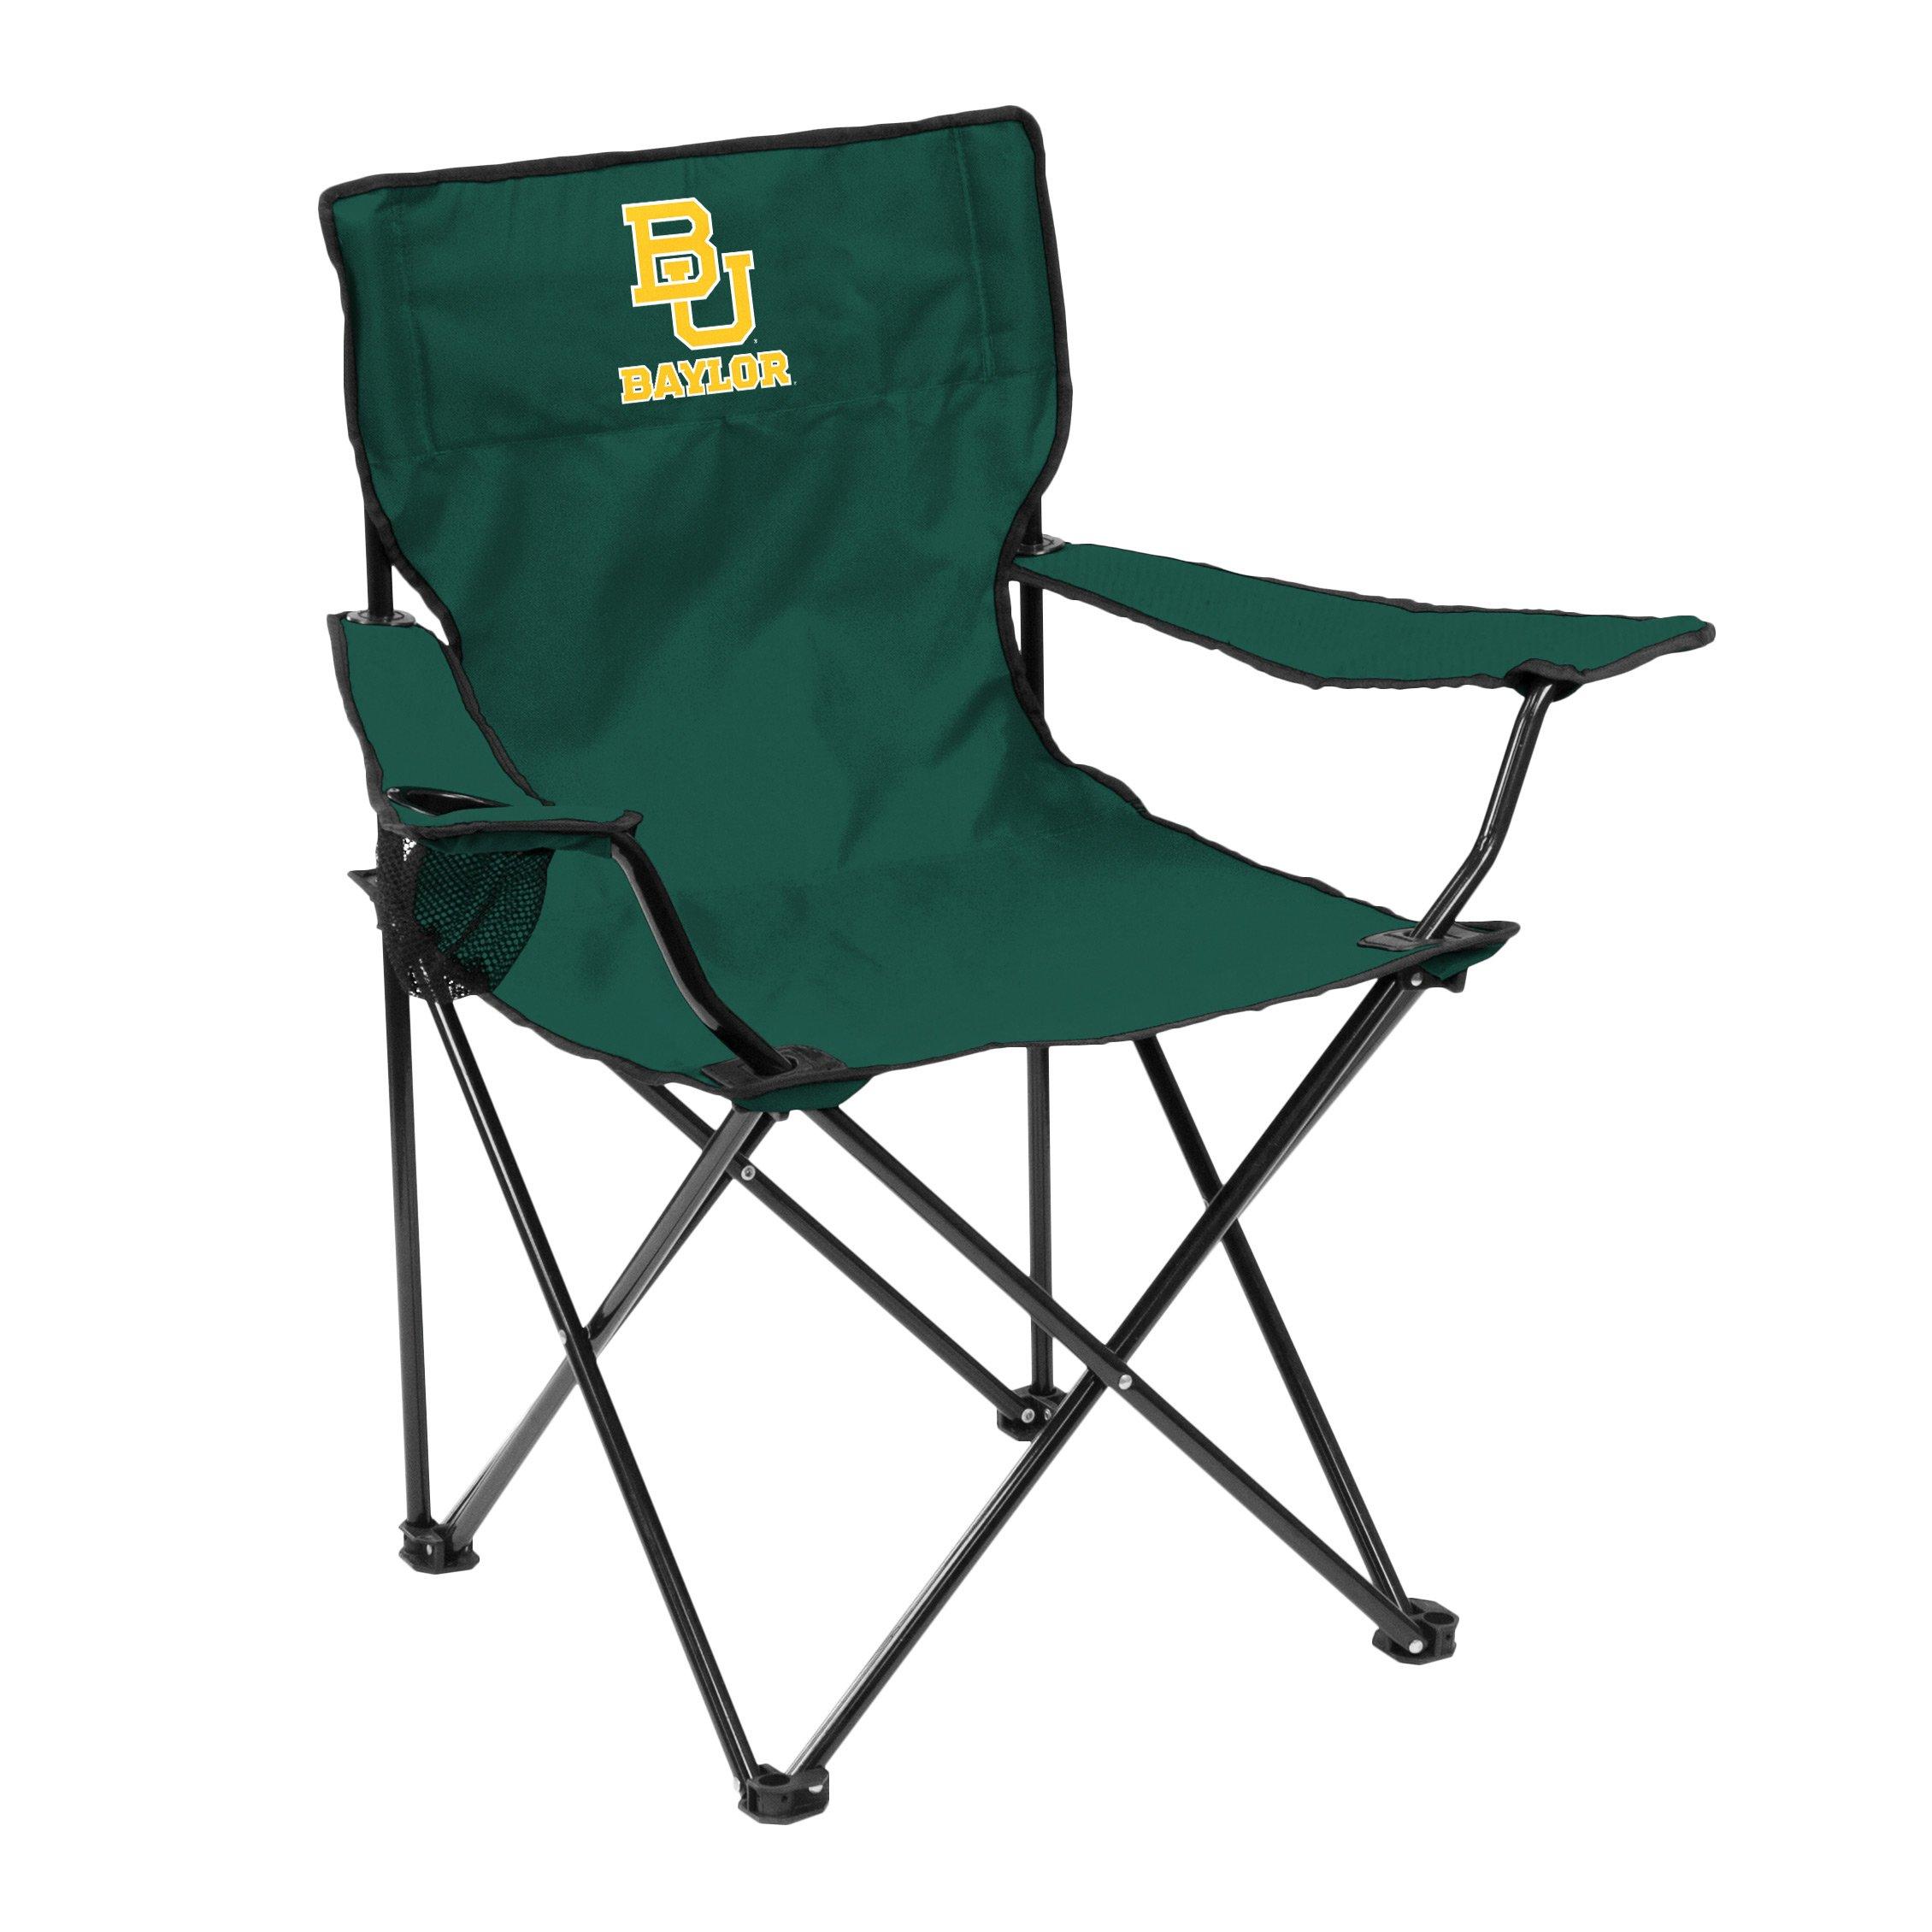 NCAA Baylor Bears Quad Chair, Adult, Green